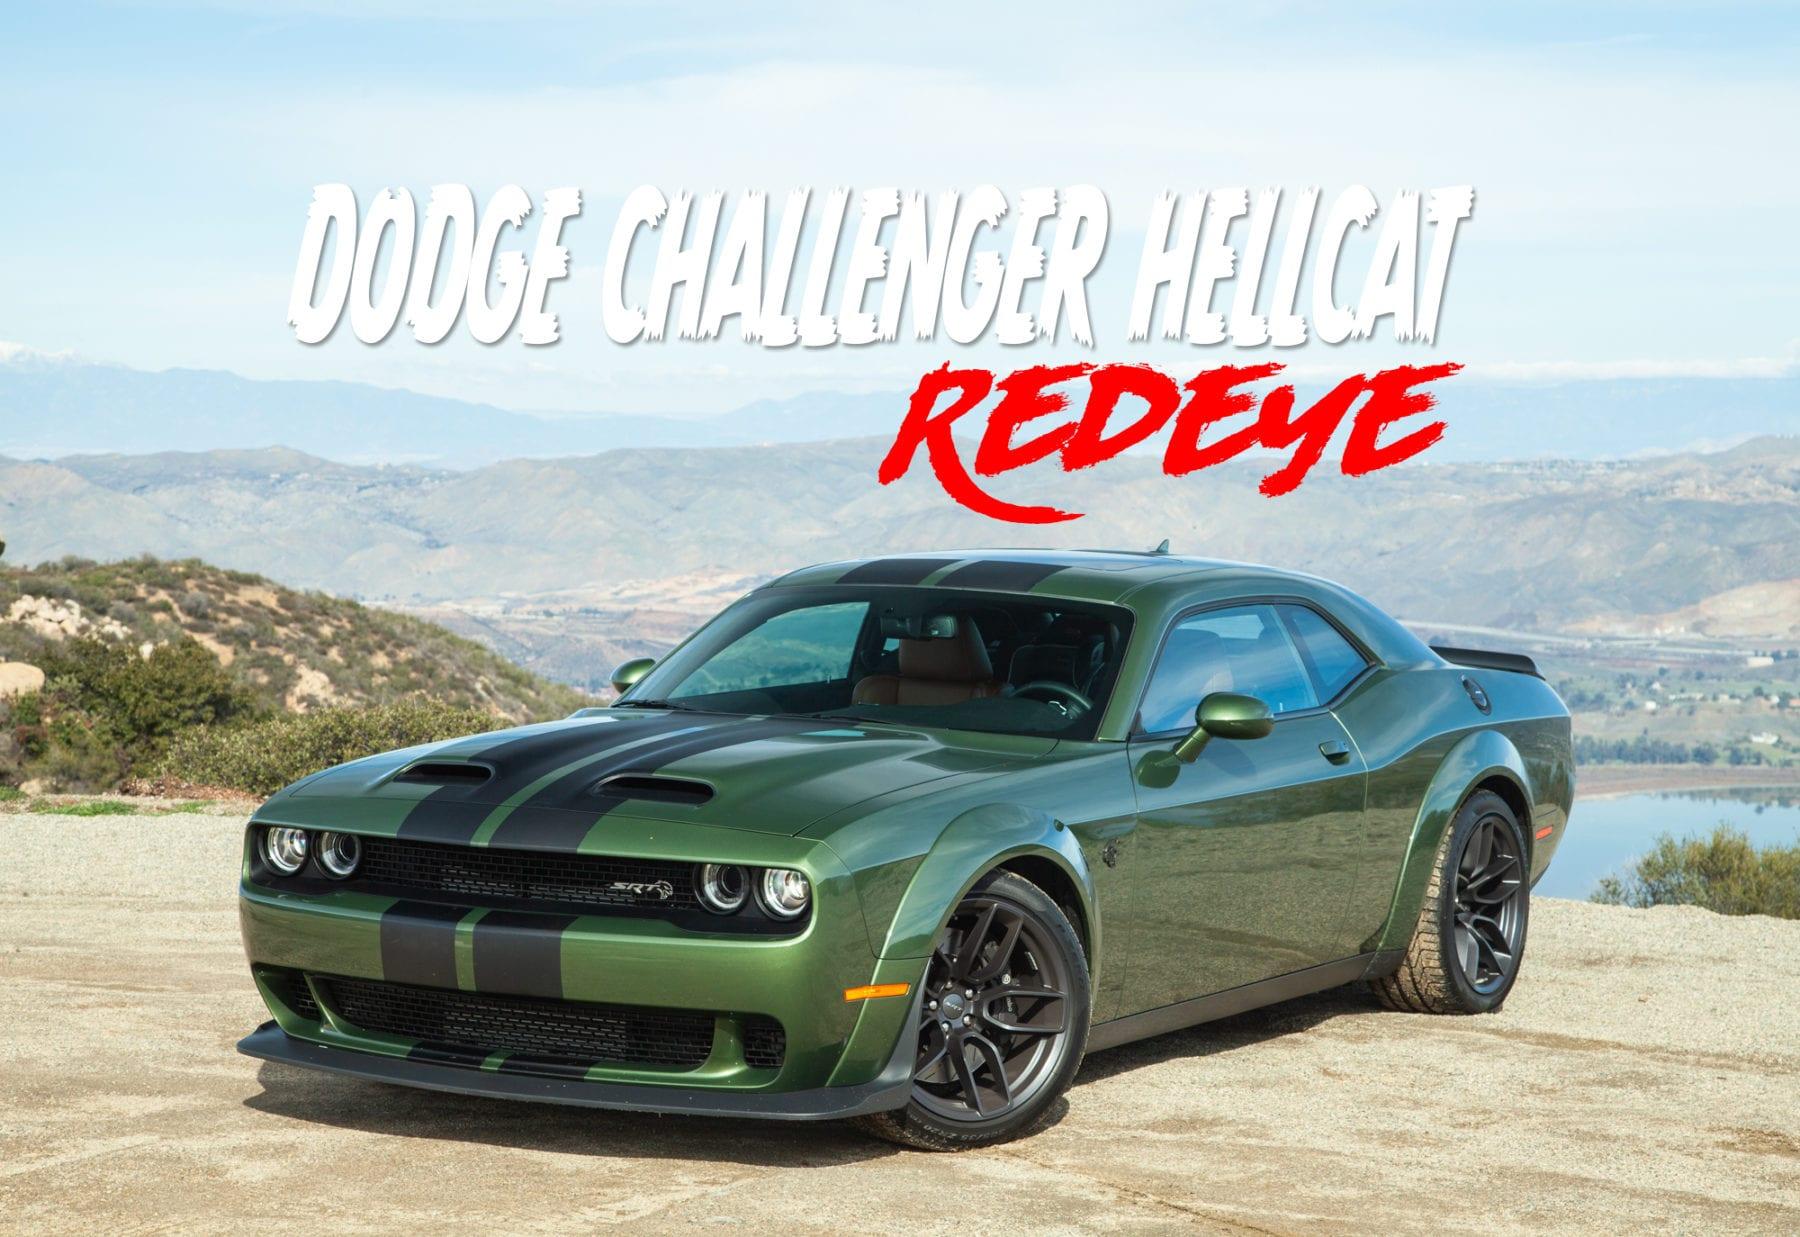 Dodge-Challenger-Hellcat-Redeye